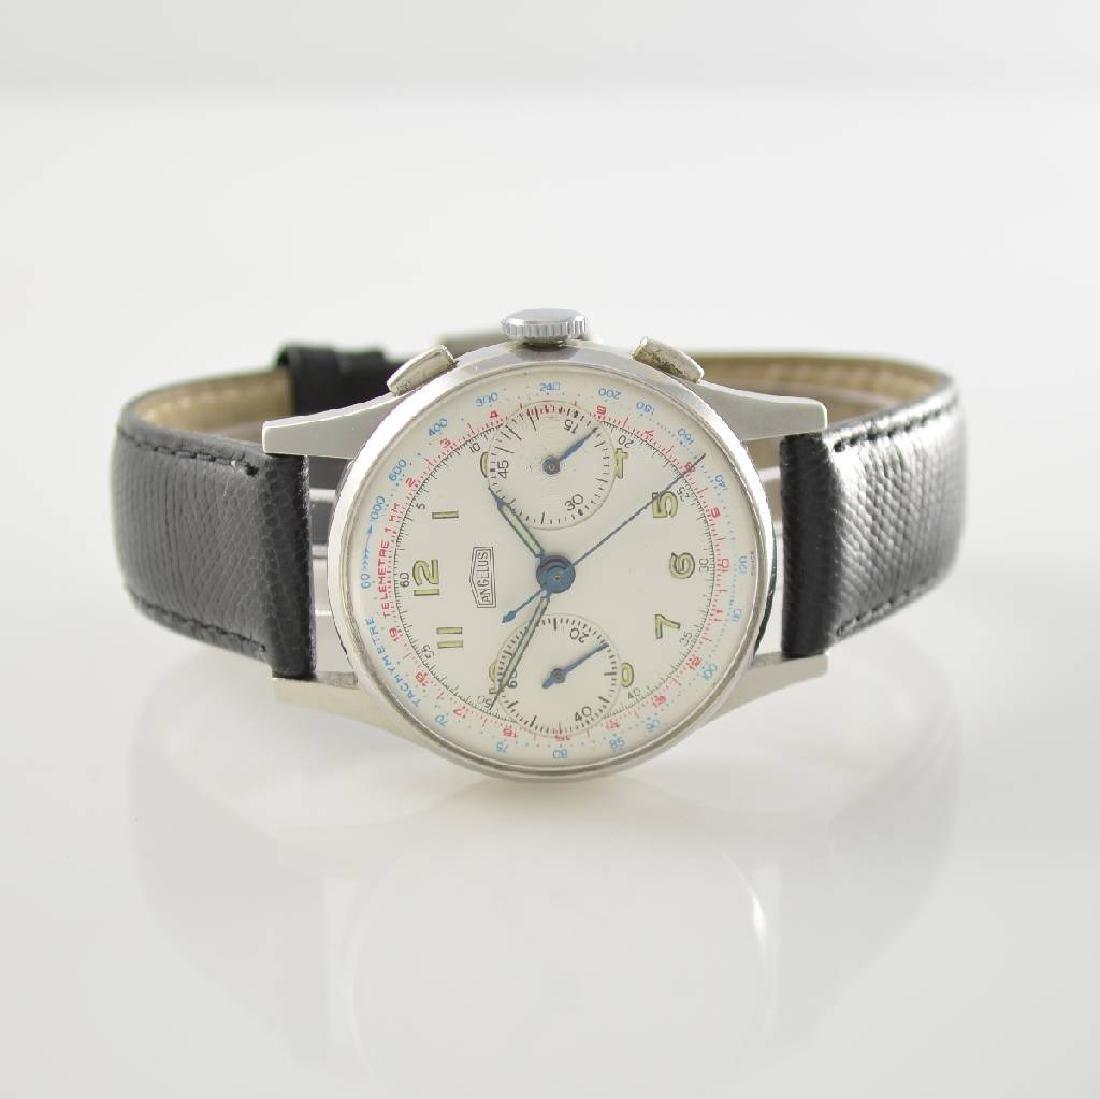 ANGELUS manual wound intermediate wheel chronograph